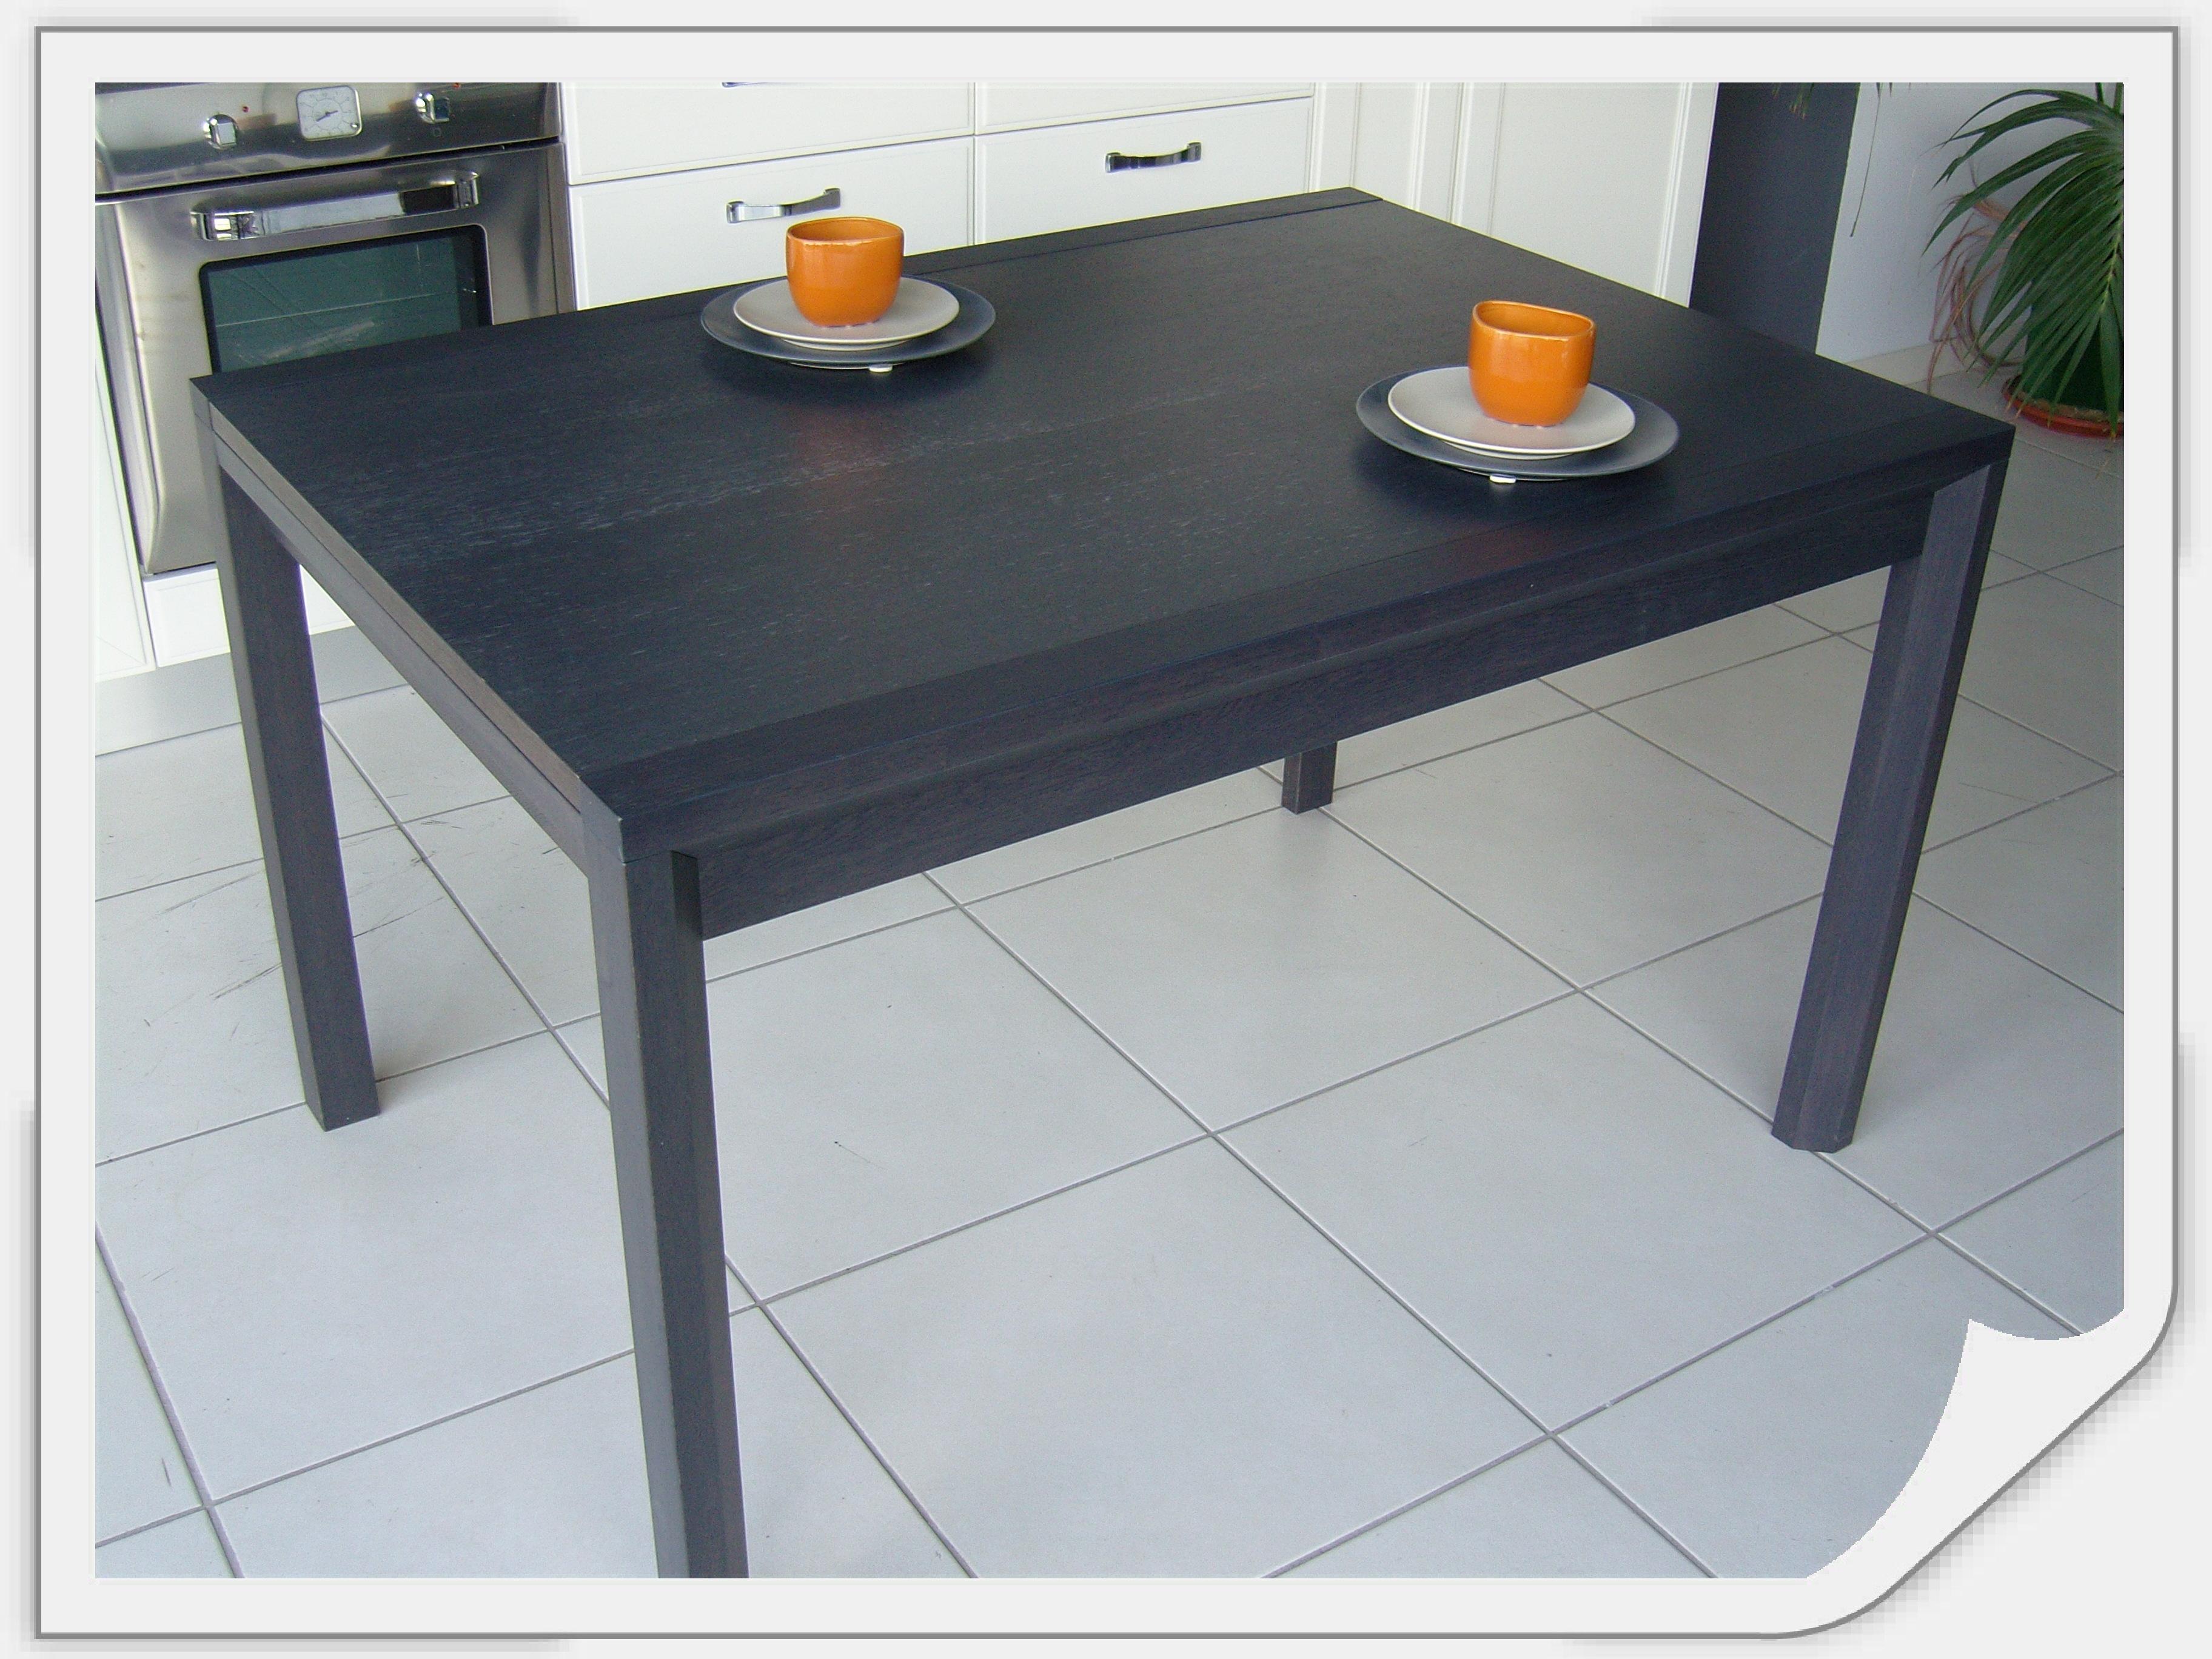 Ged tavoli design per la casa - Ged cucine treviso ...